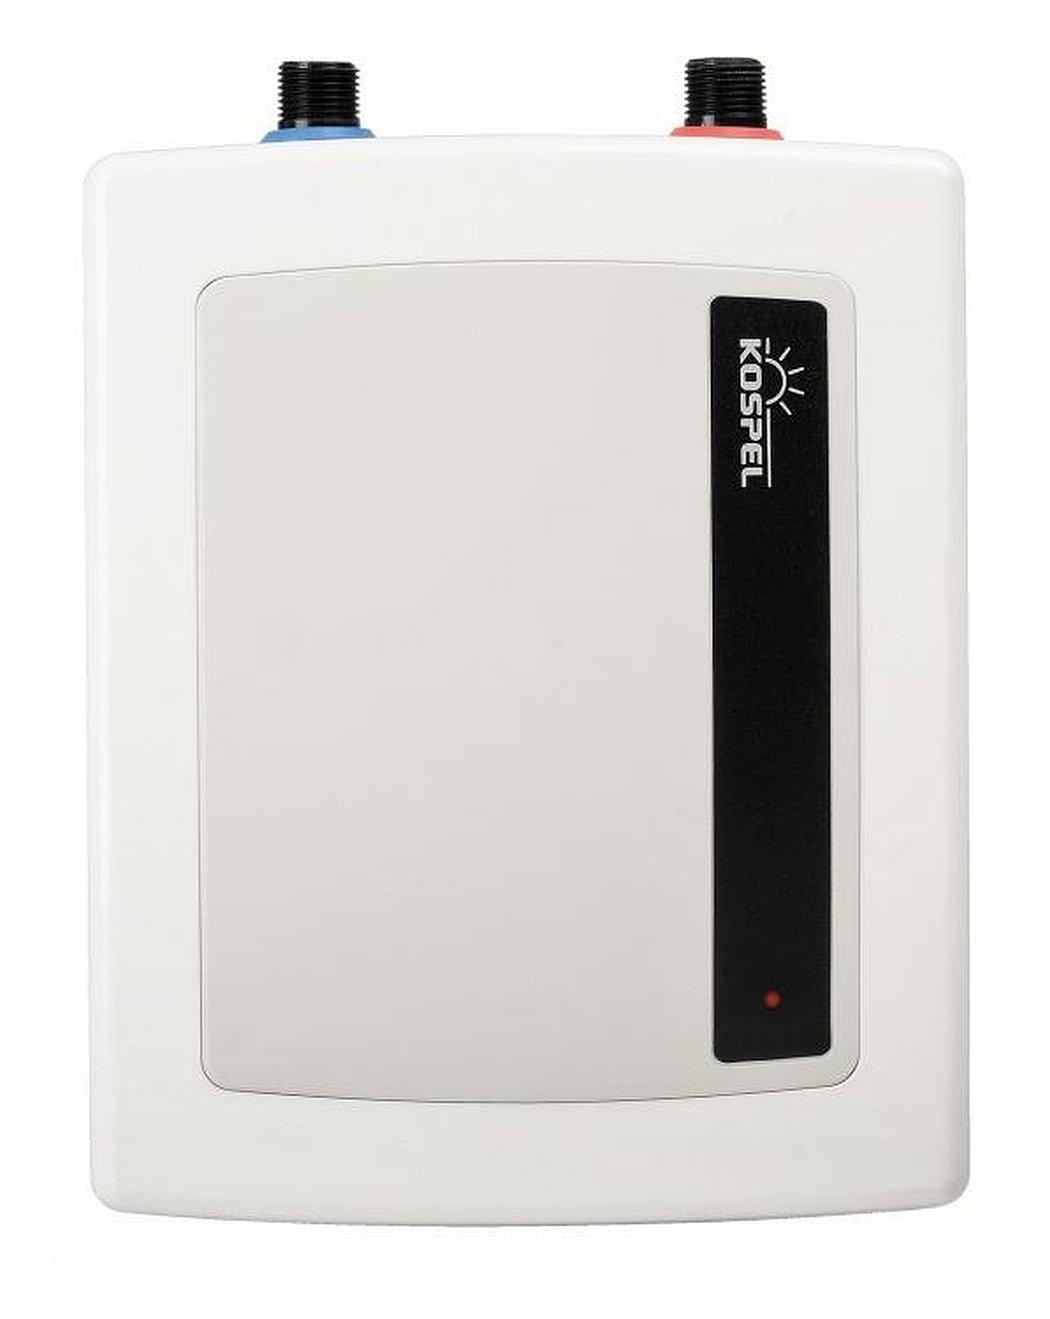 Kospel Instantaneous Water Amicus Epo2 6kw 230v Instant Electric Ariston Andris R 10 L 200 Watt Watet Heater Undersink Energy Class A Diy Tools